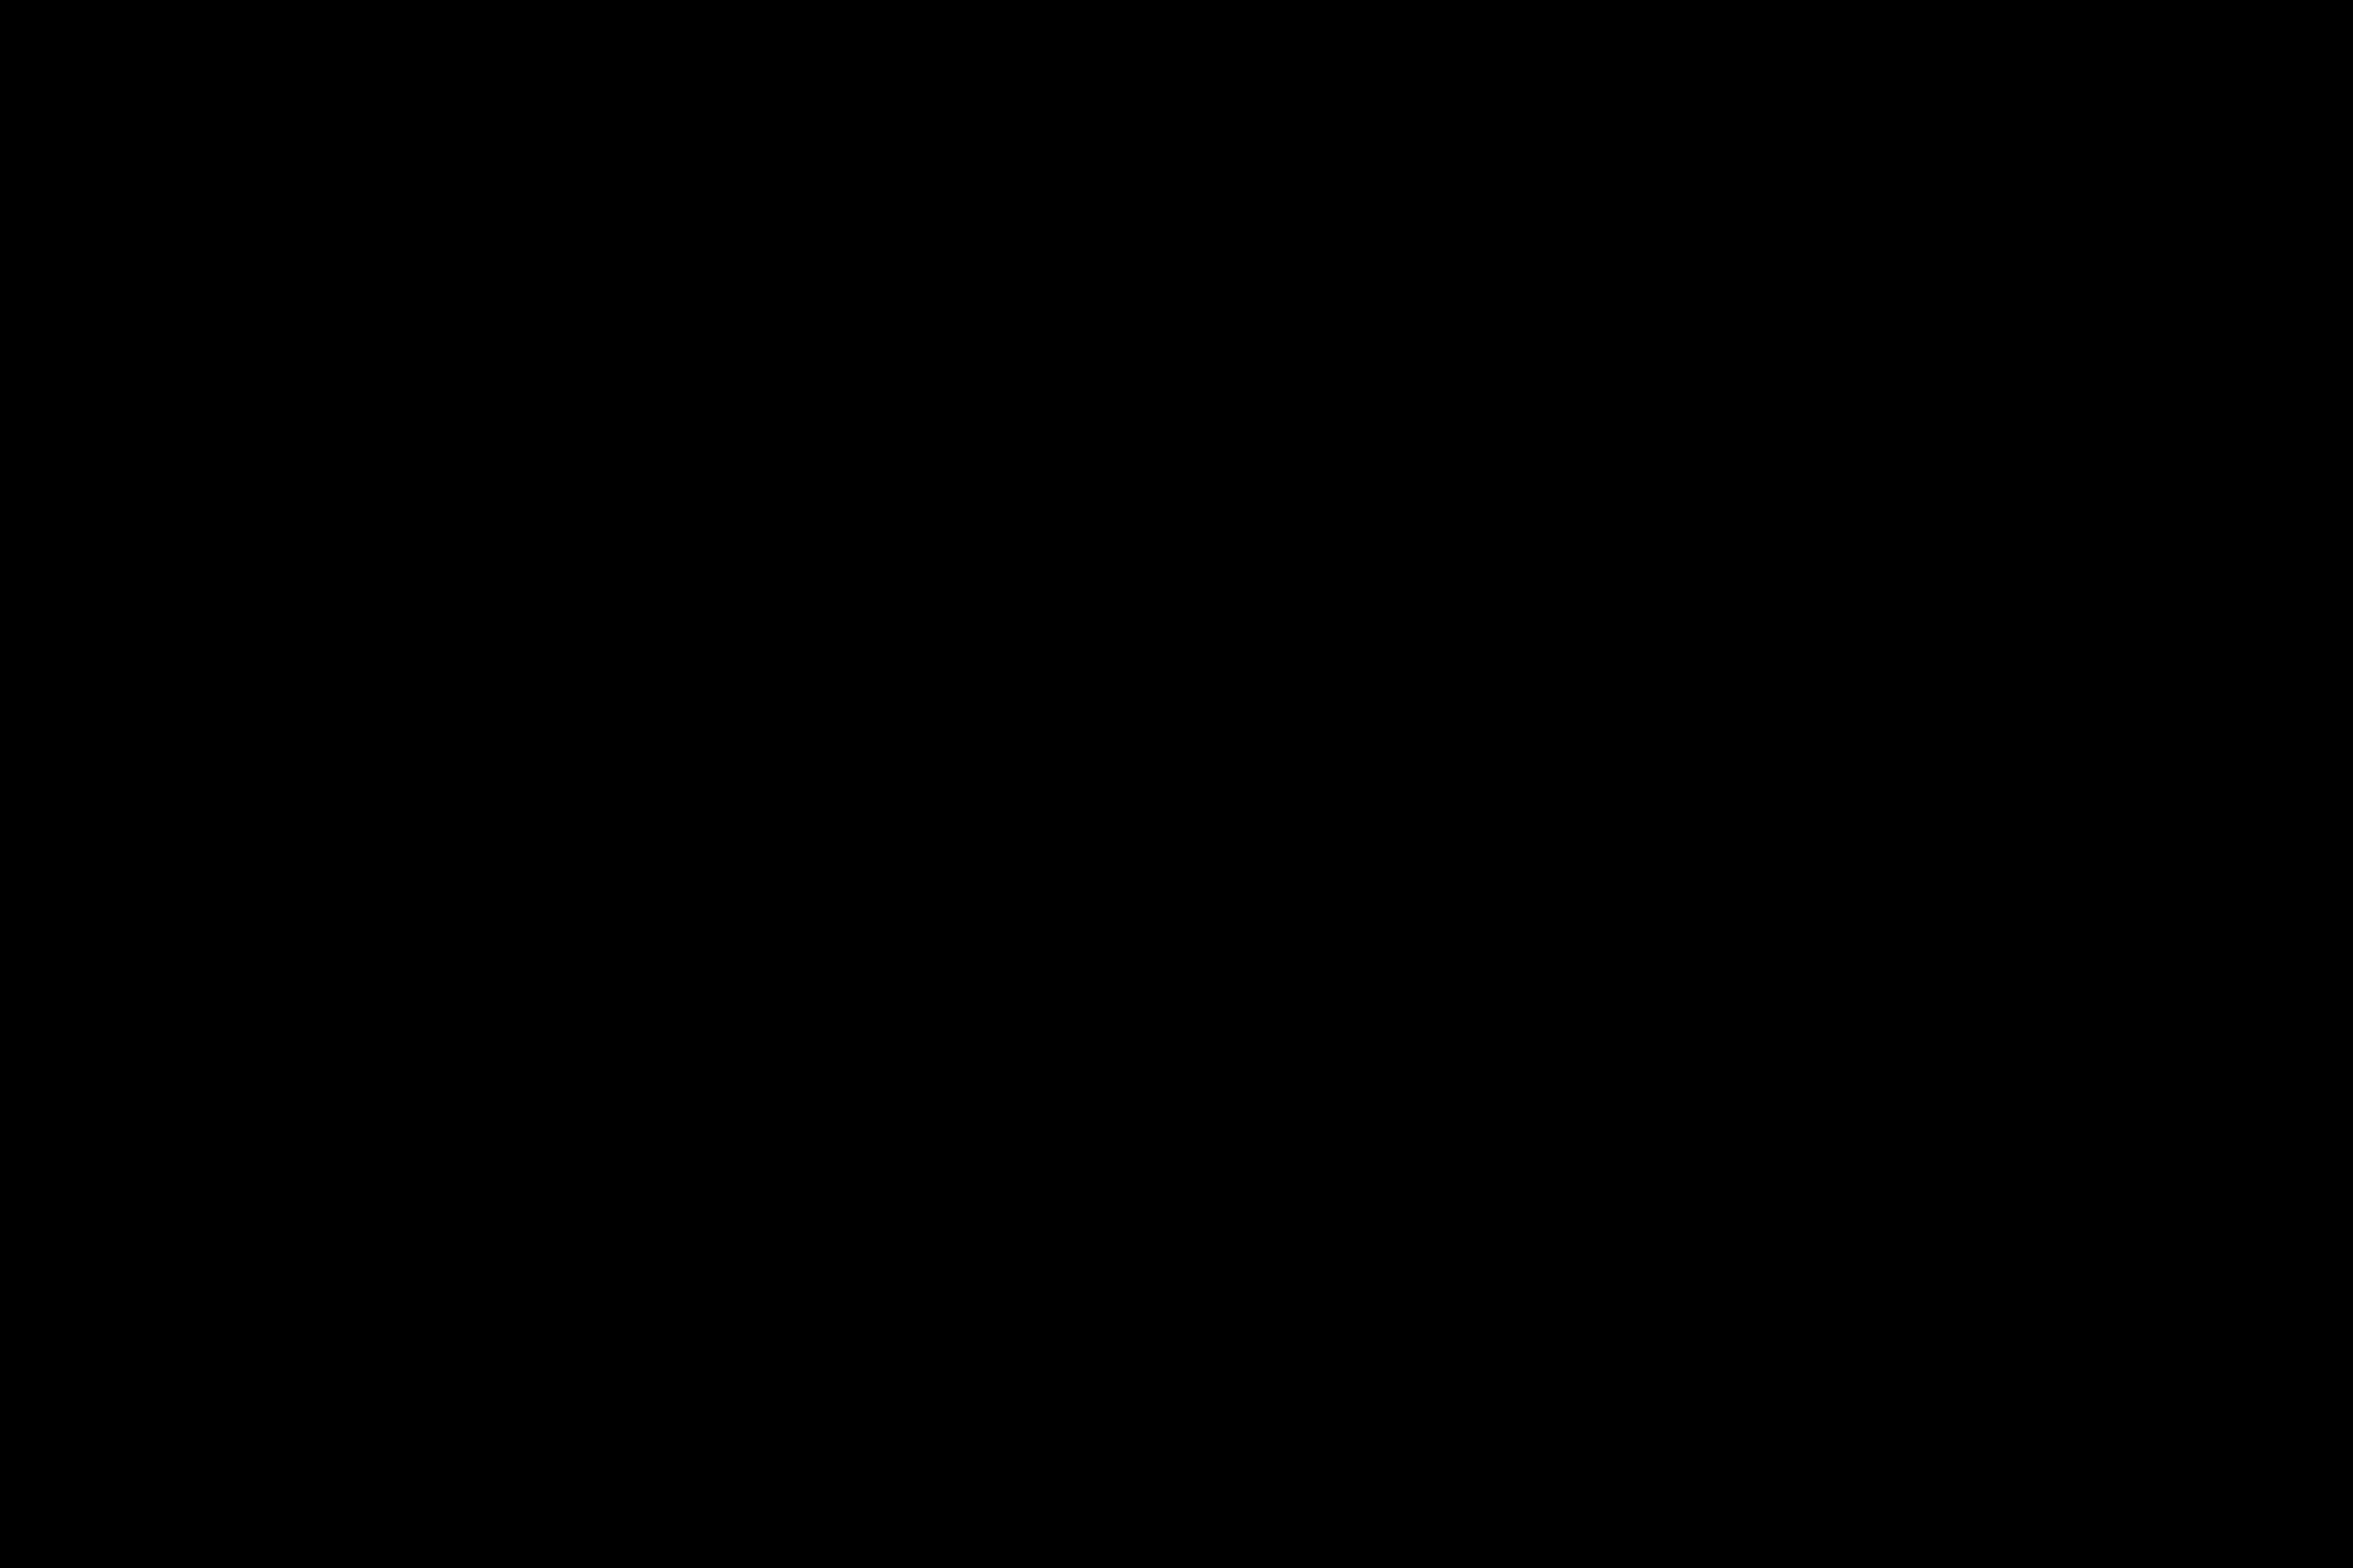 mg_1845